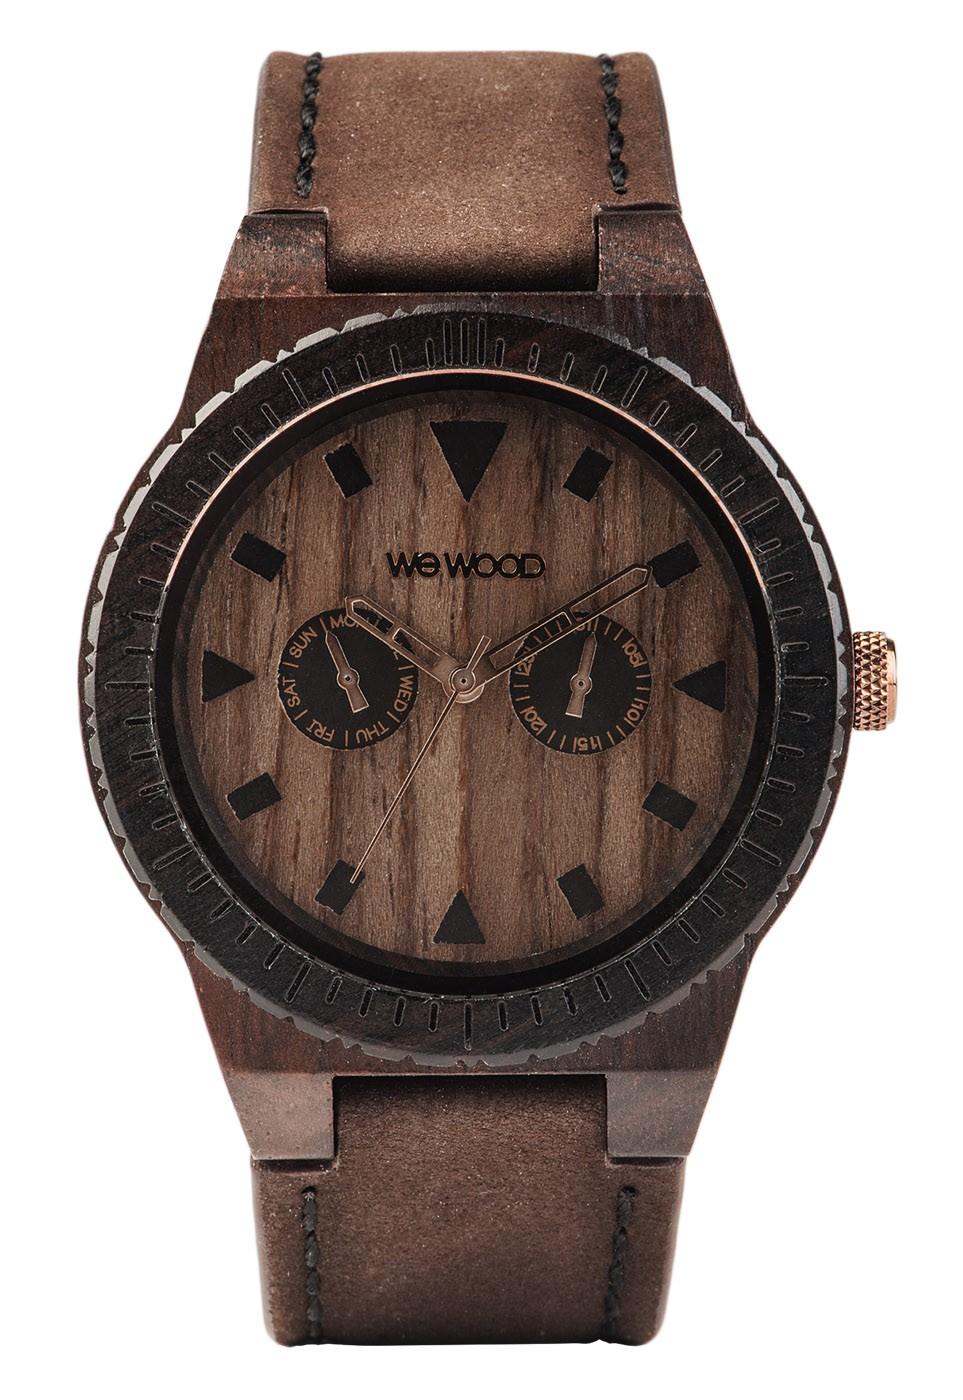 Relógio de Madeira WeWood Leo Leather Chocolate